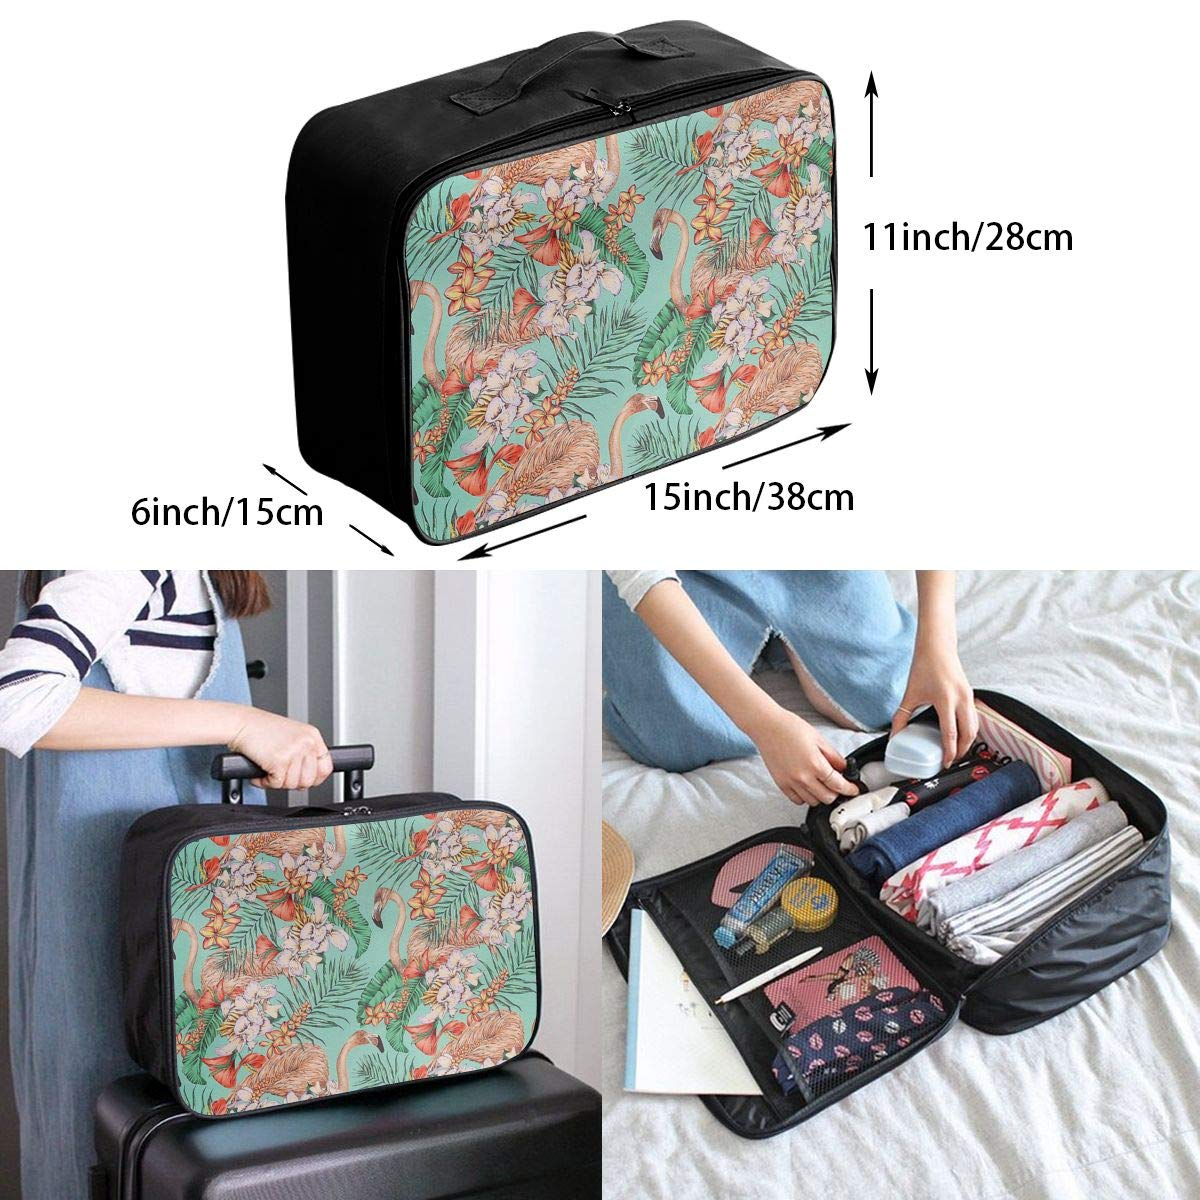 Travel Luggage Duffle Bag Lightweight Portable Handbag Flamingo Retro Floral Pattern Large Capacity Waterproof Foldable Storage Tote